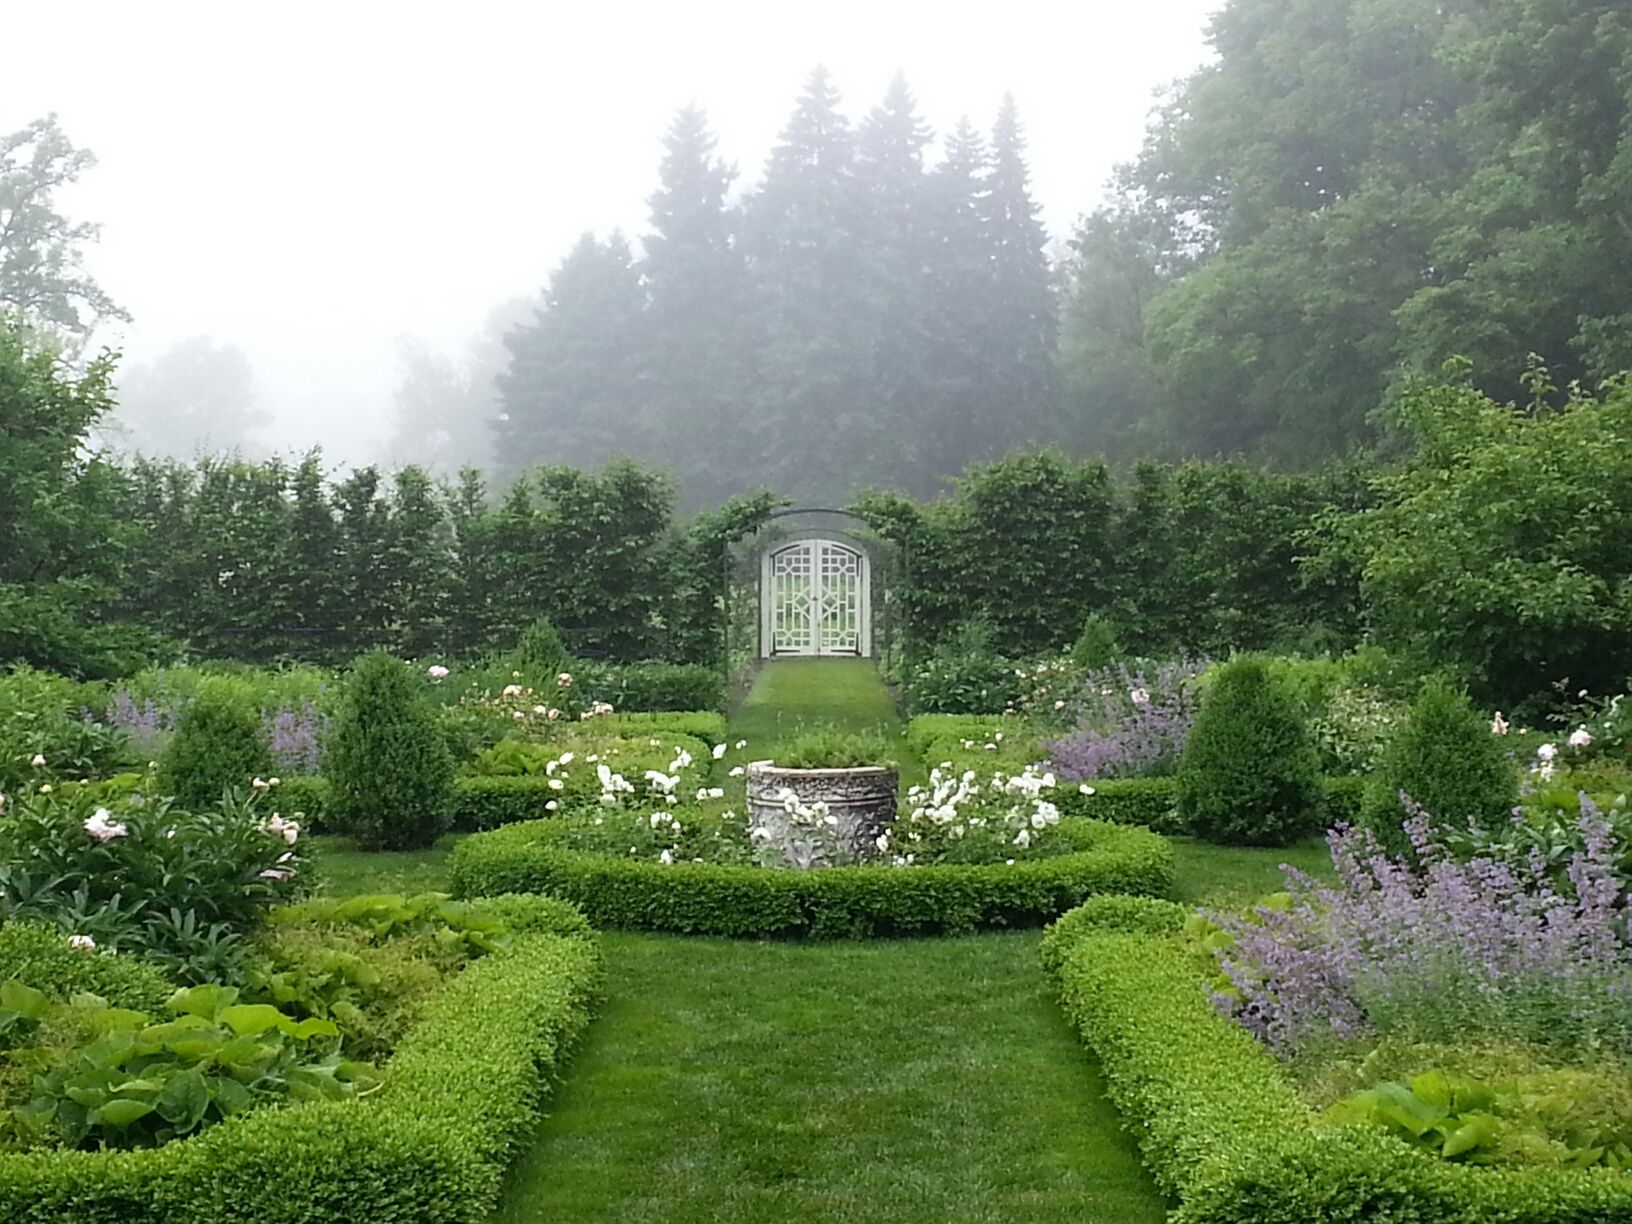 Beautiful rose garden in the mist. Plants 'Iceberg' Rose